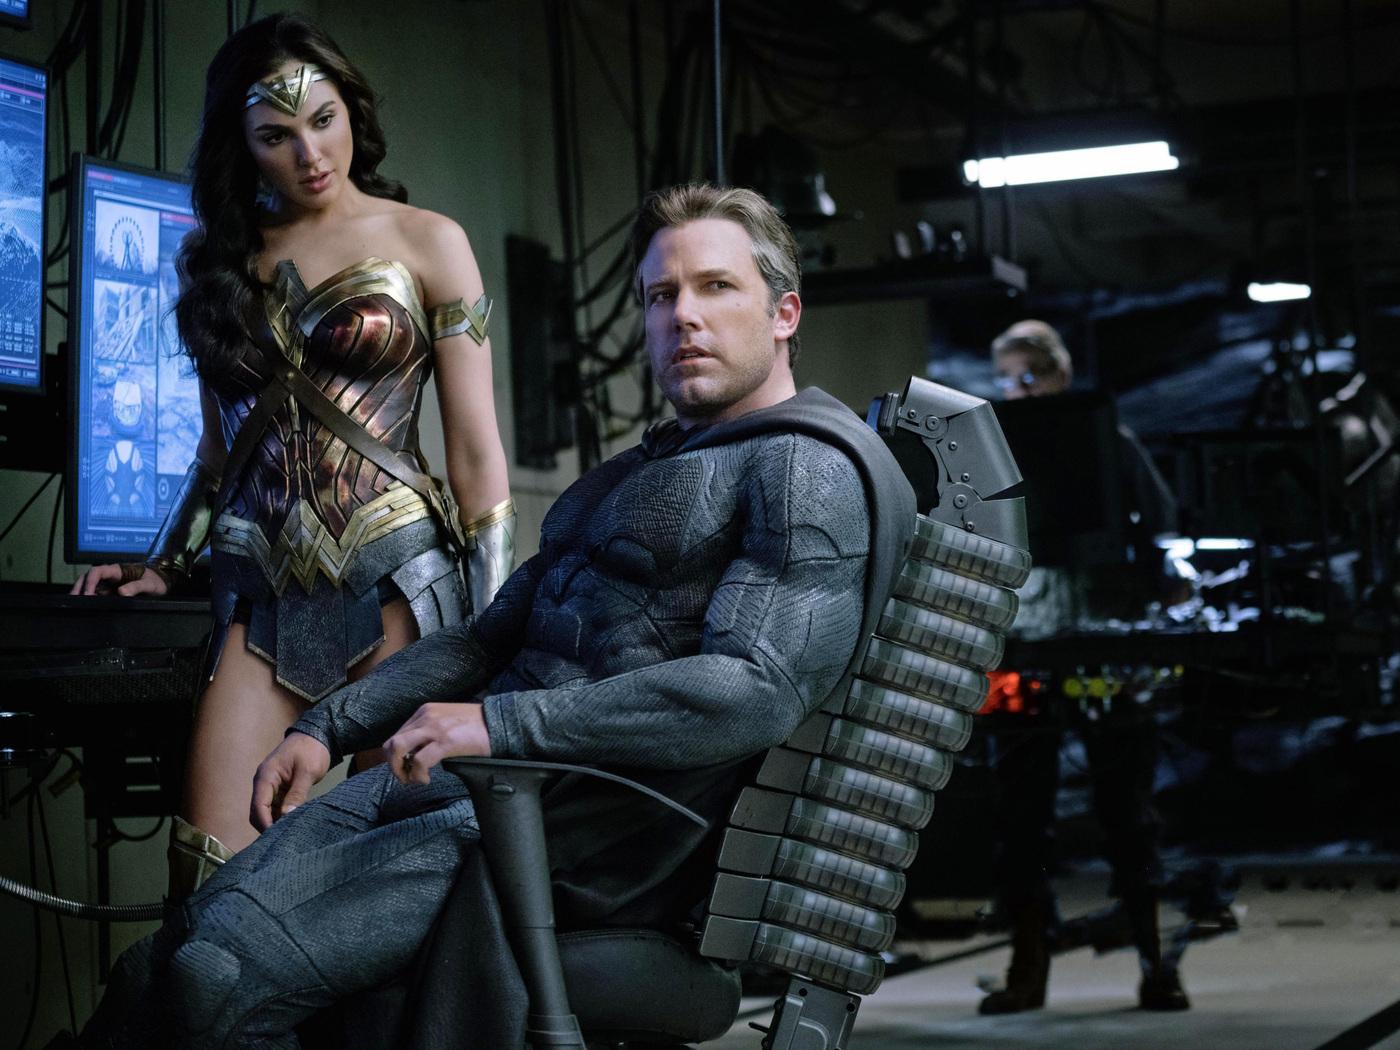 ben-affleck-as-batman-gal-gadot-wonder-woman-justice-league-2017-4k-vb.jpg